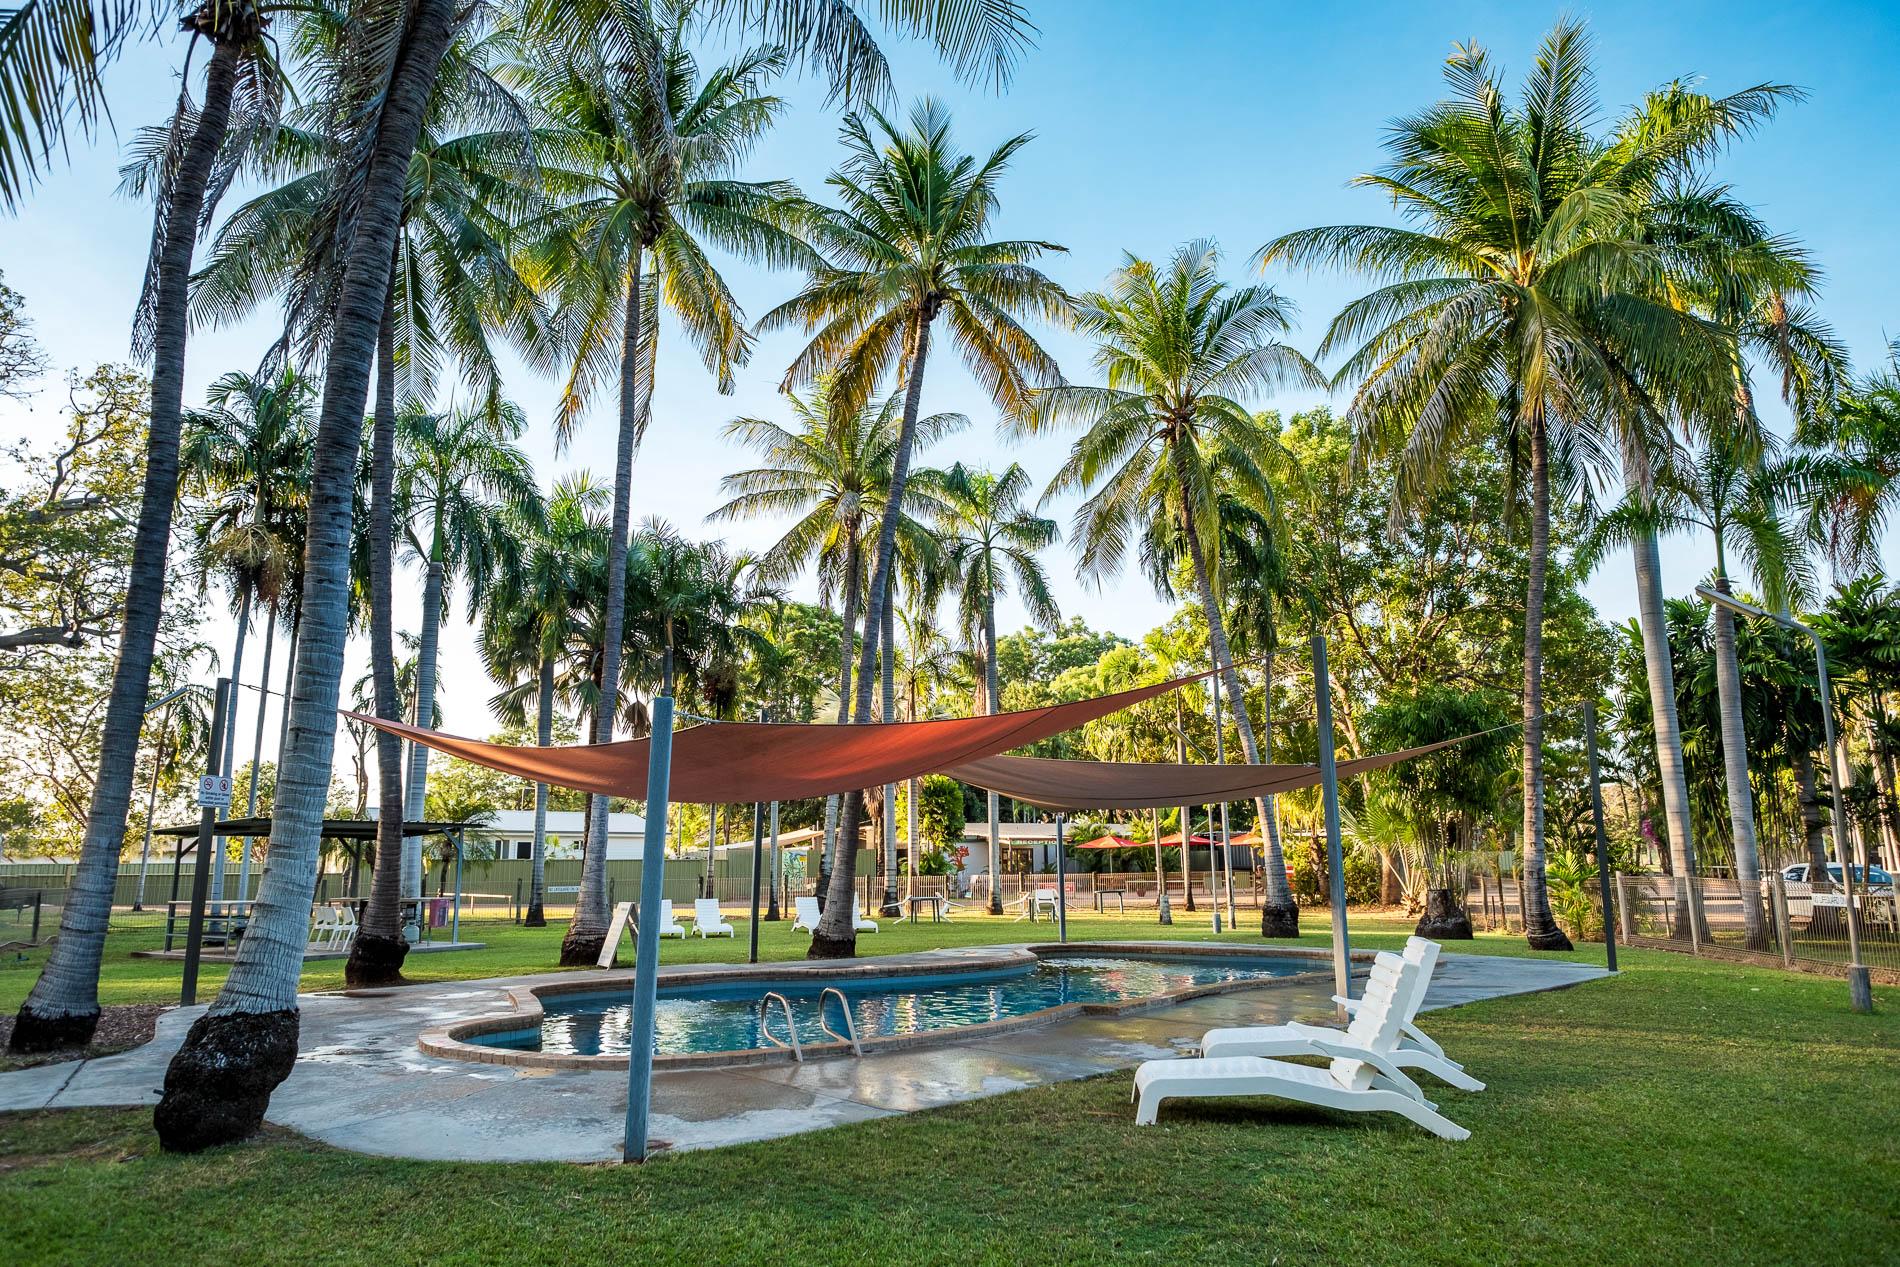 Coconut Palms Tropical Setting Pool